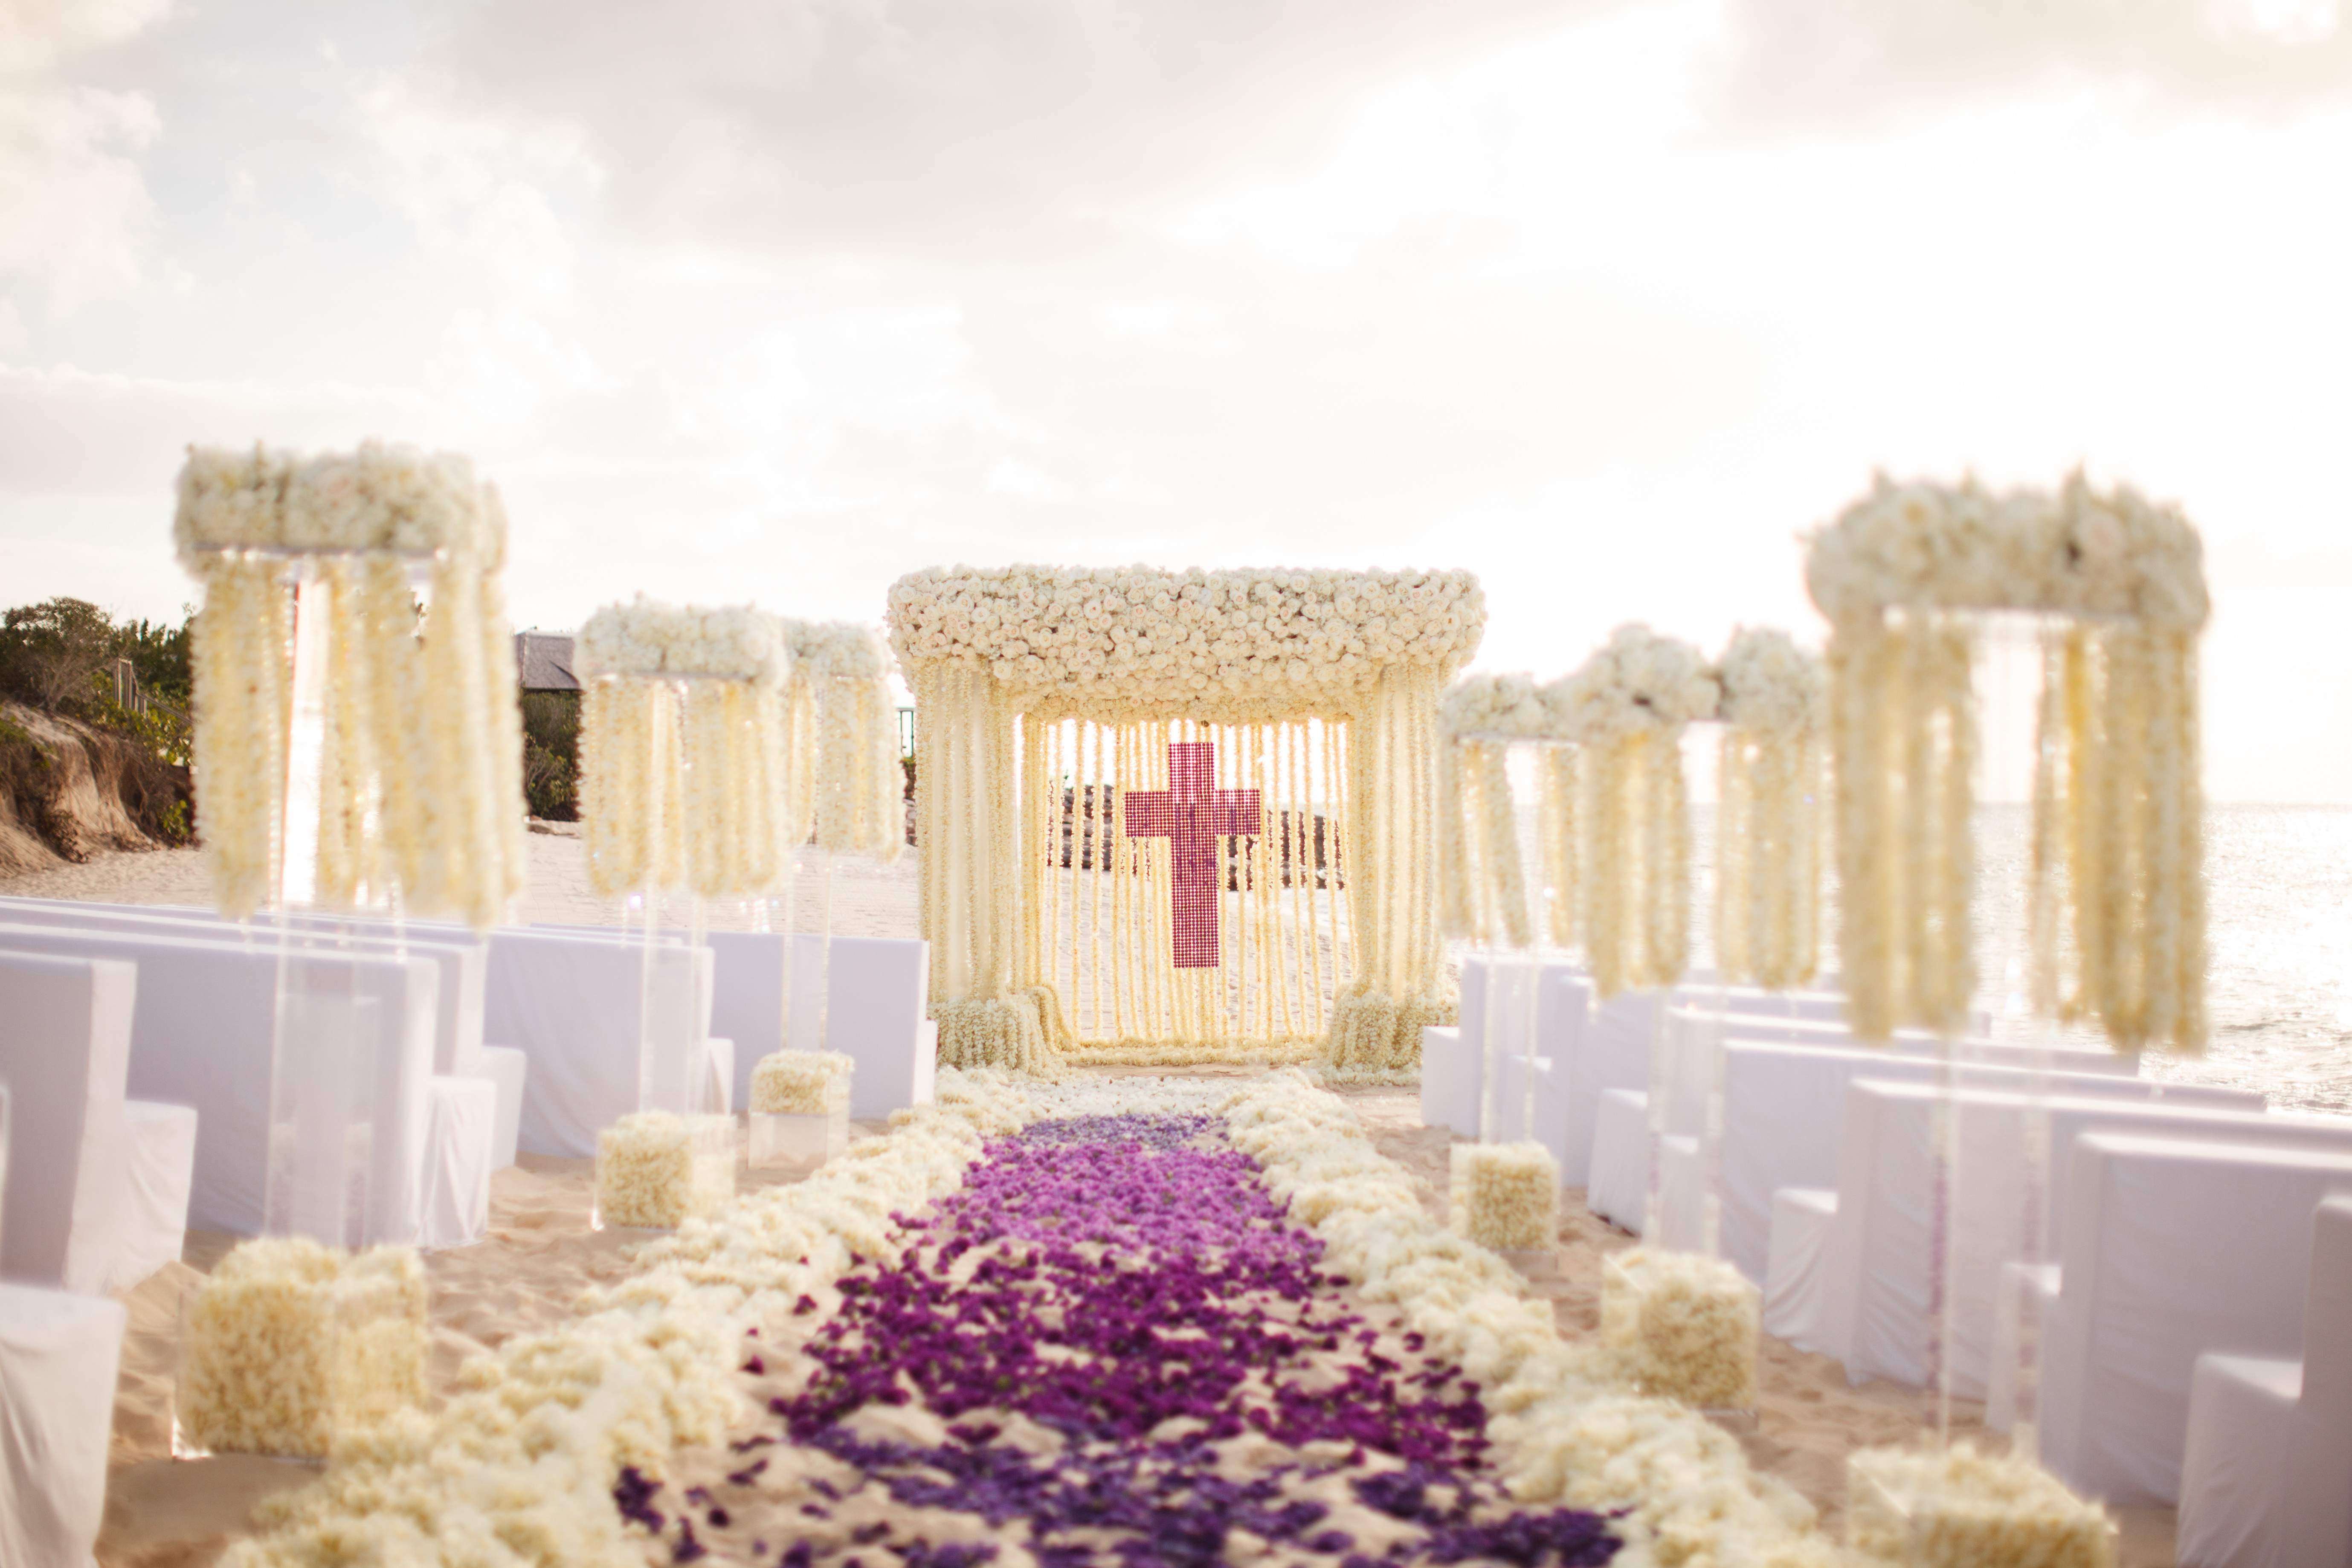 Christian beach wedding with flowers